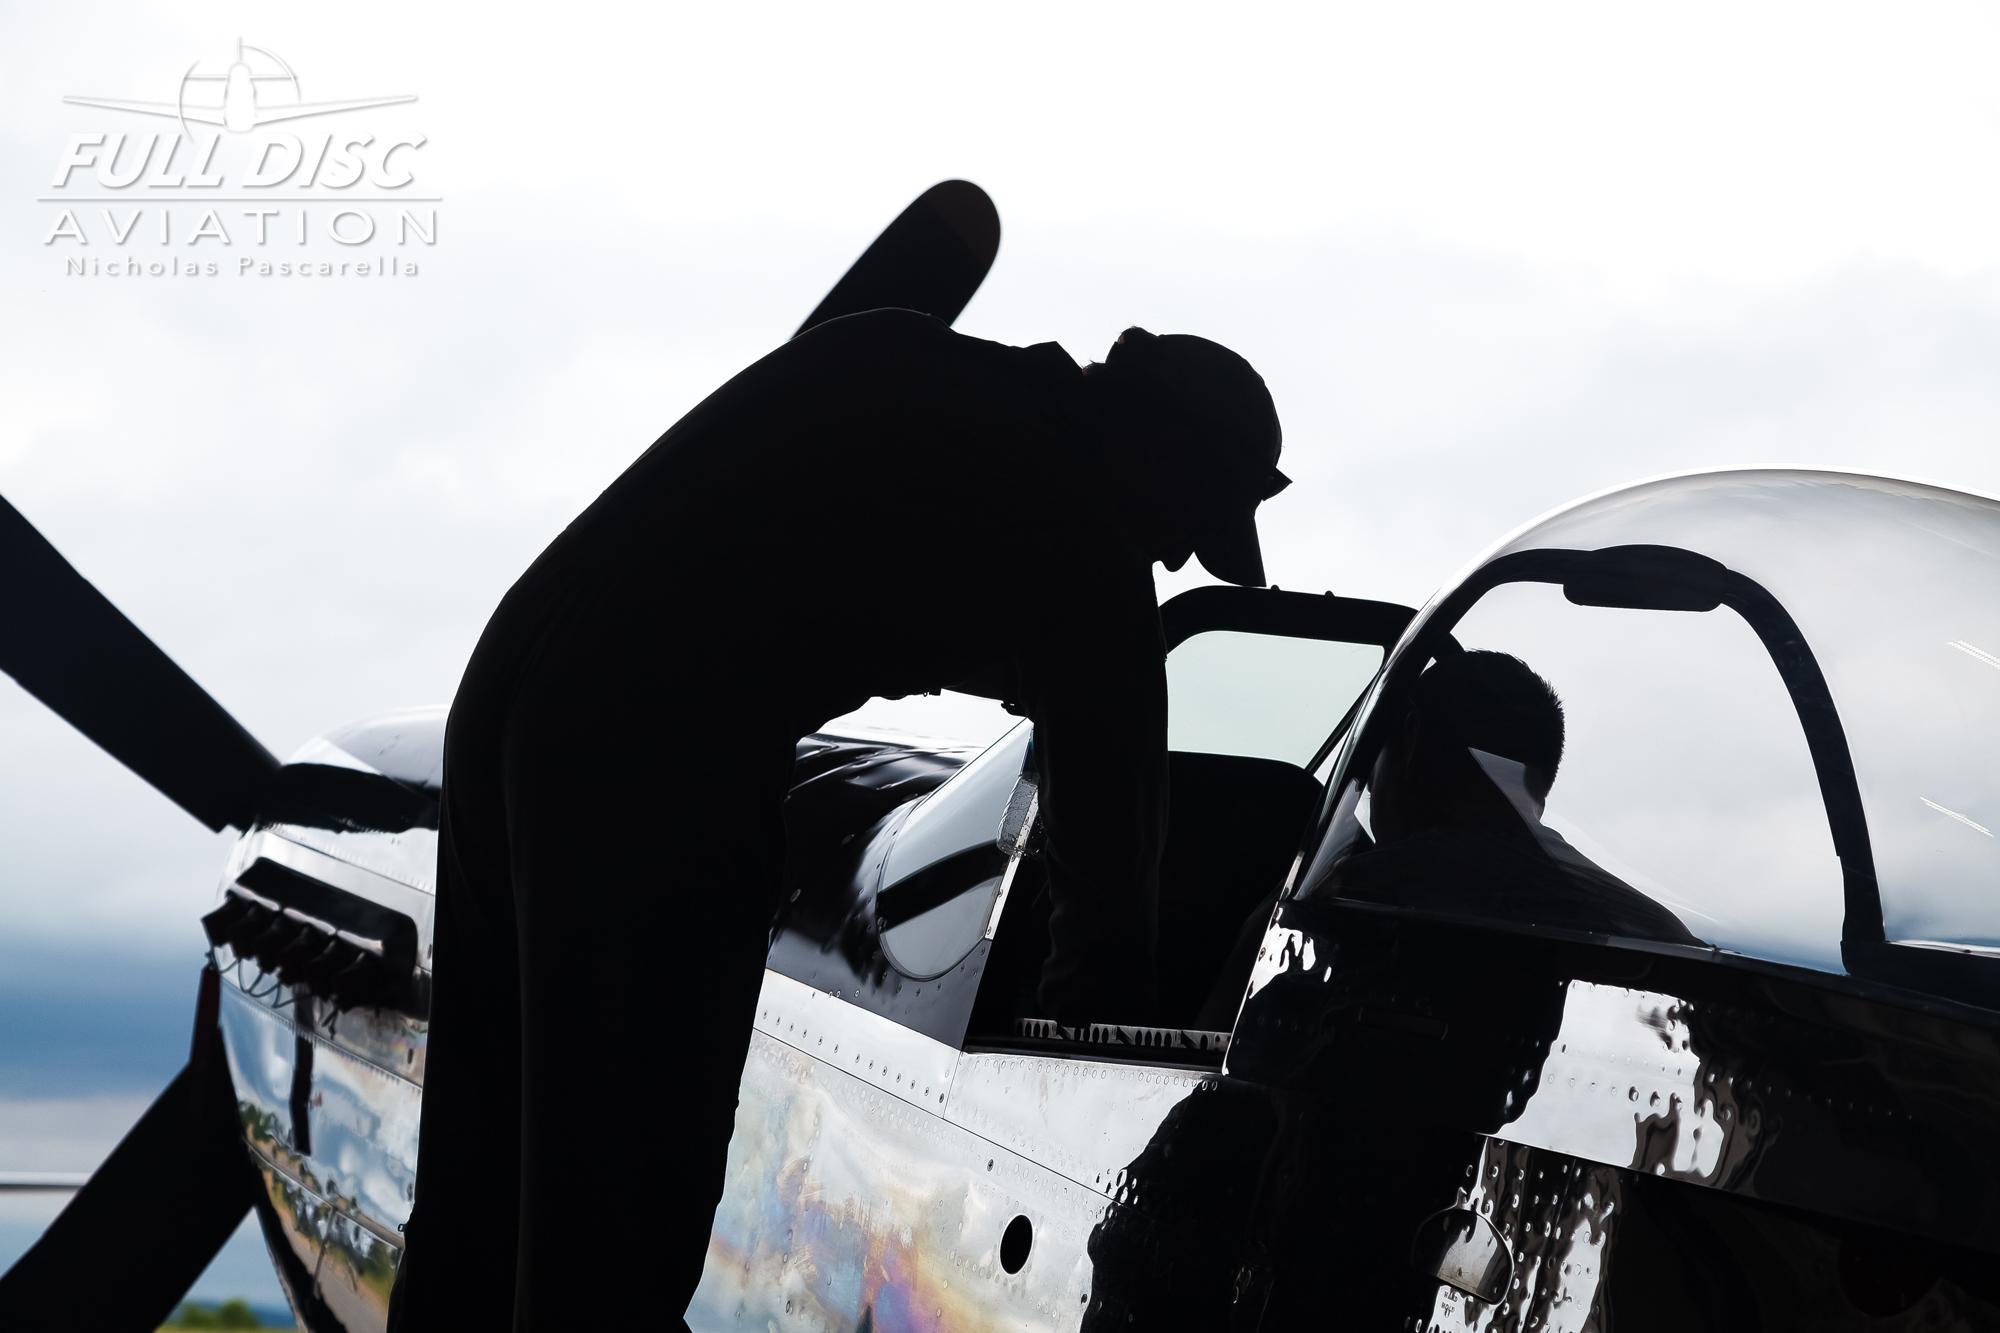 andrewmckenna_fulldiscaviation_nickpascarella_silhouette_cockpit.jpg